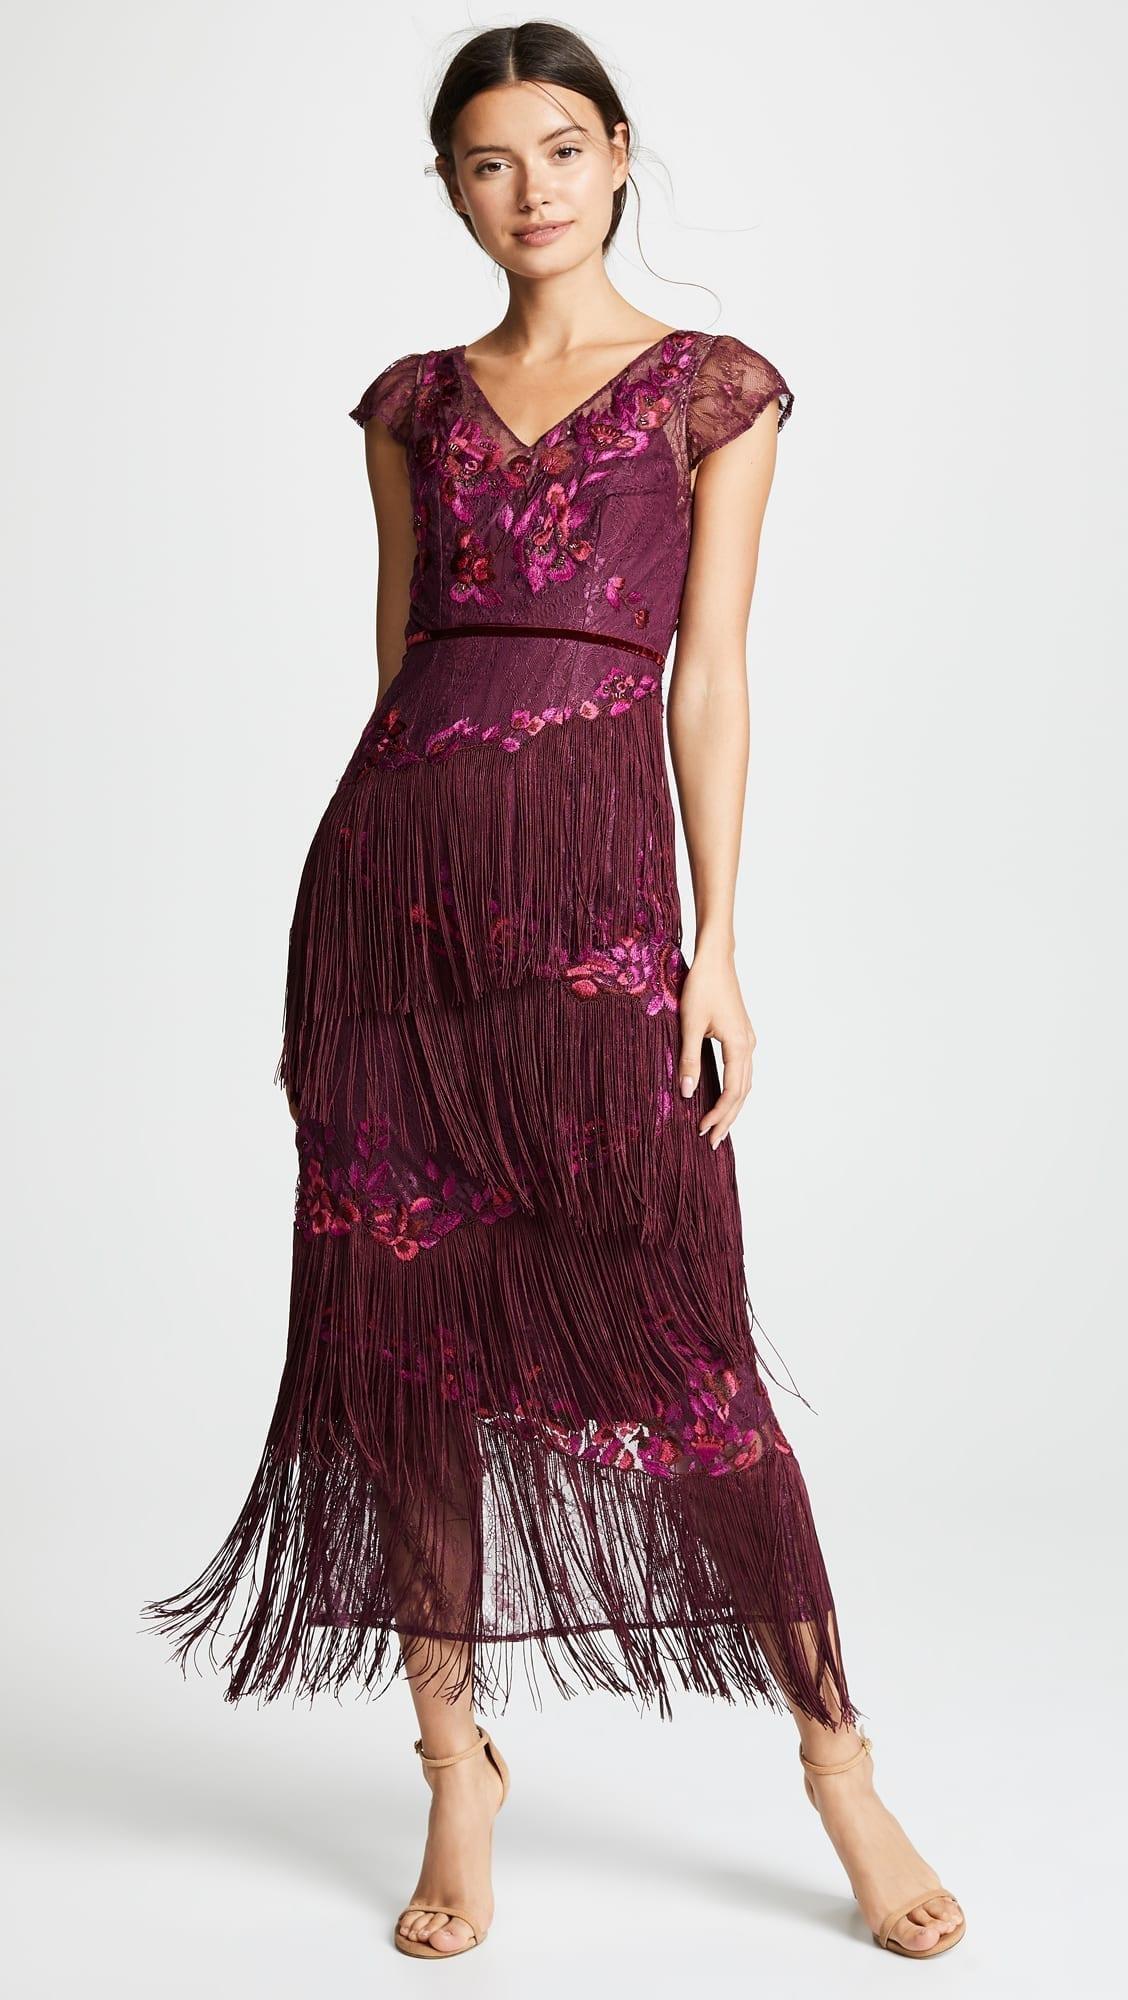 87bf5ed46e11 MARCHESA NOTTE Cap Sleeve Floral Embroidery Velvet Fringe Purple Gown